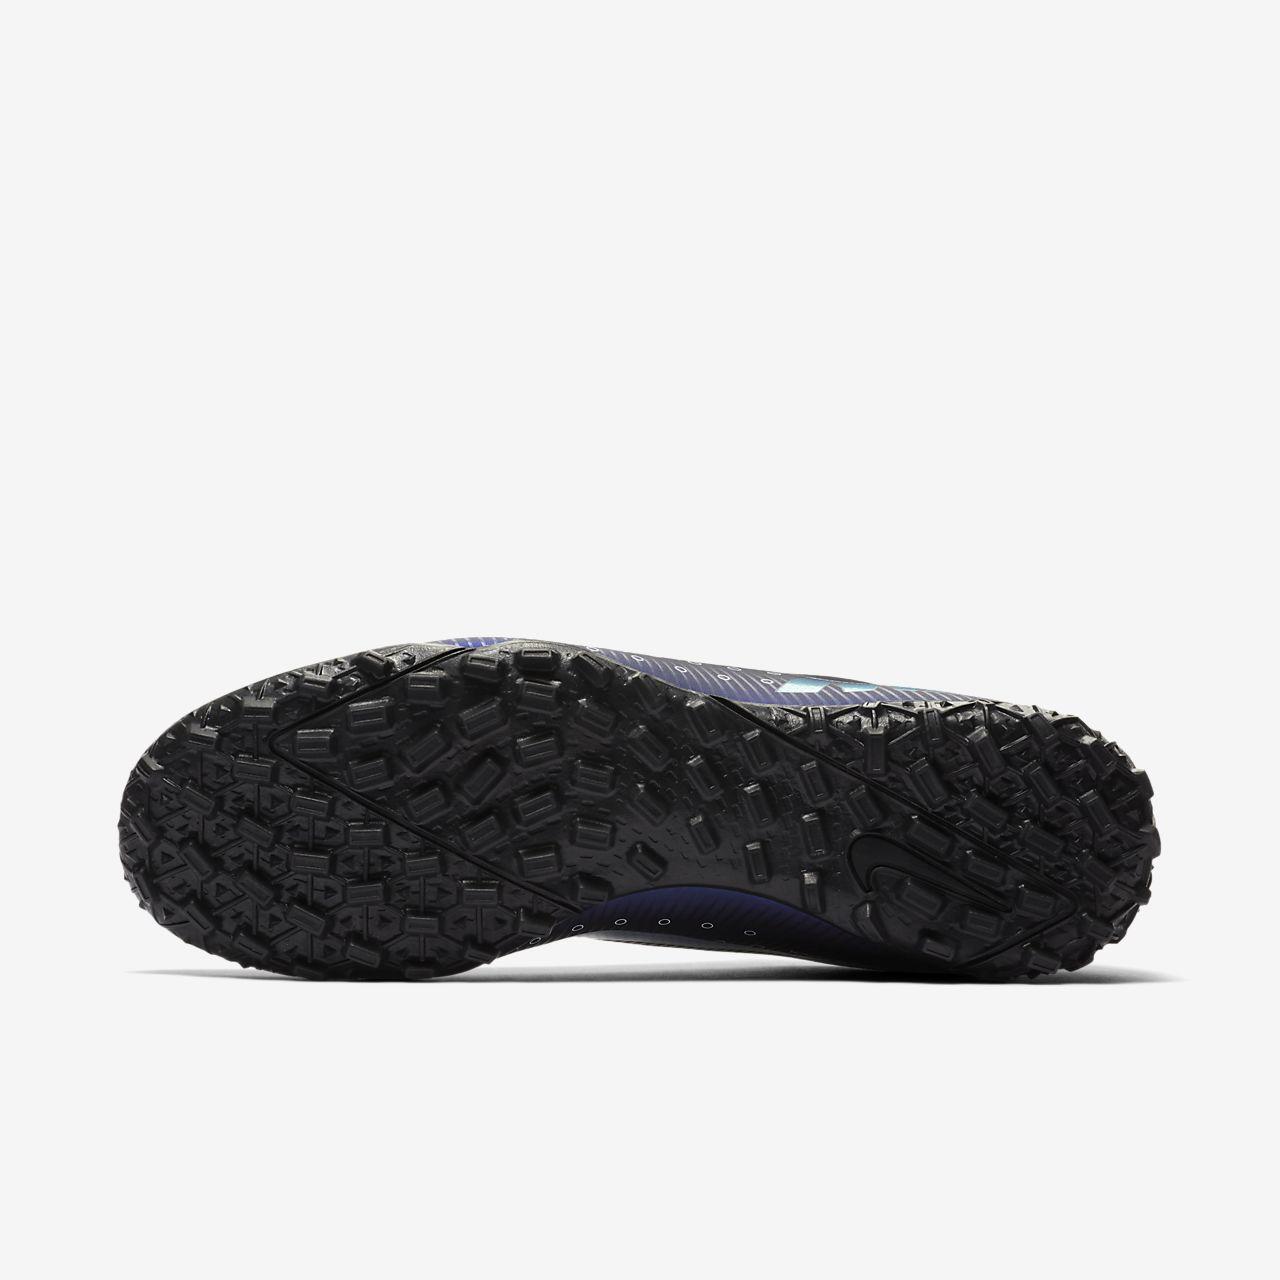 Nike Mercurial Vapor 13 Academy MDS TF Botas de fútbol para hierba artificial o moqueta Turf